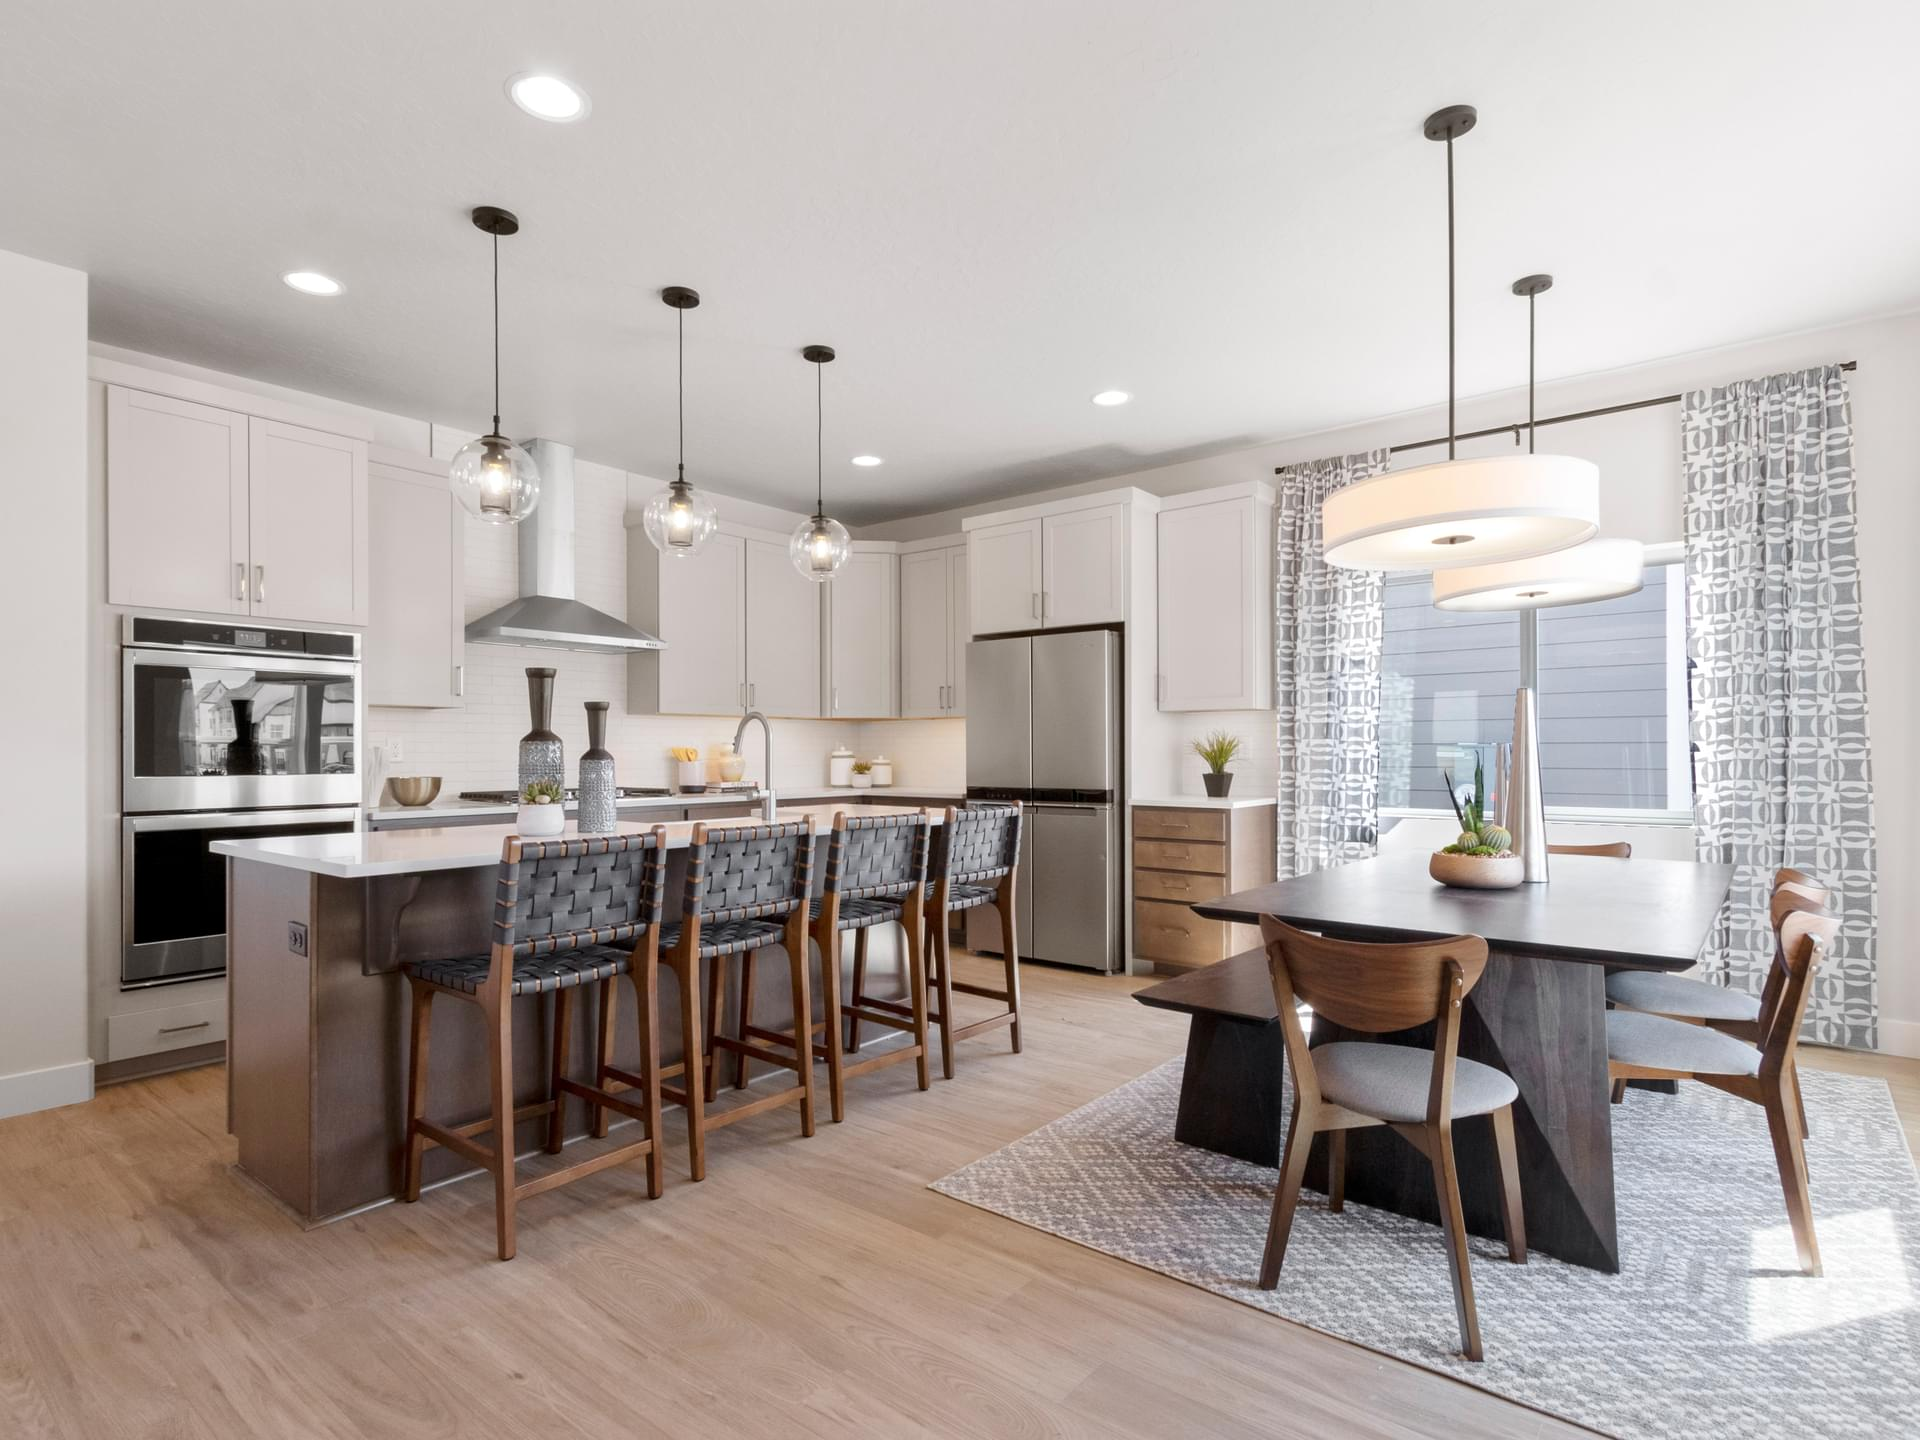 Arrowhead new Homes in Payson, UT